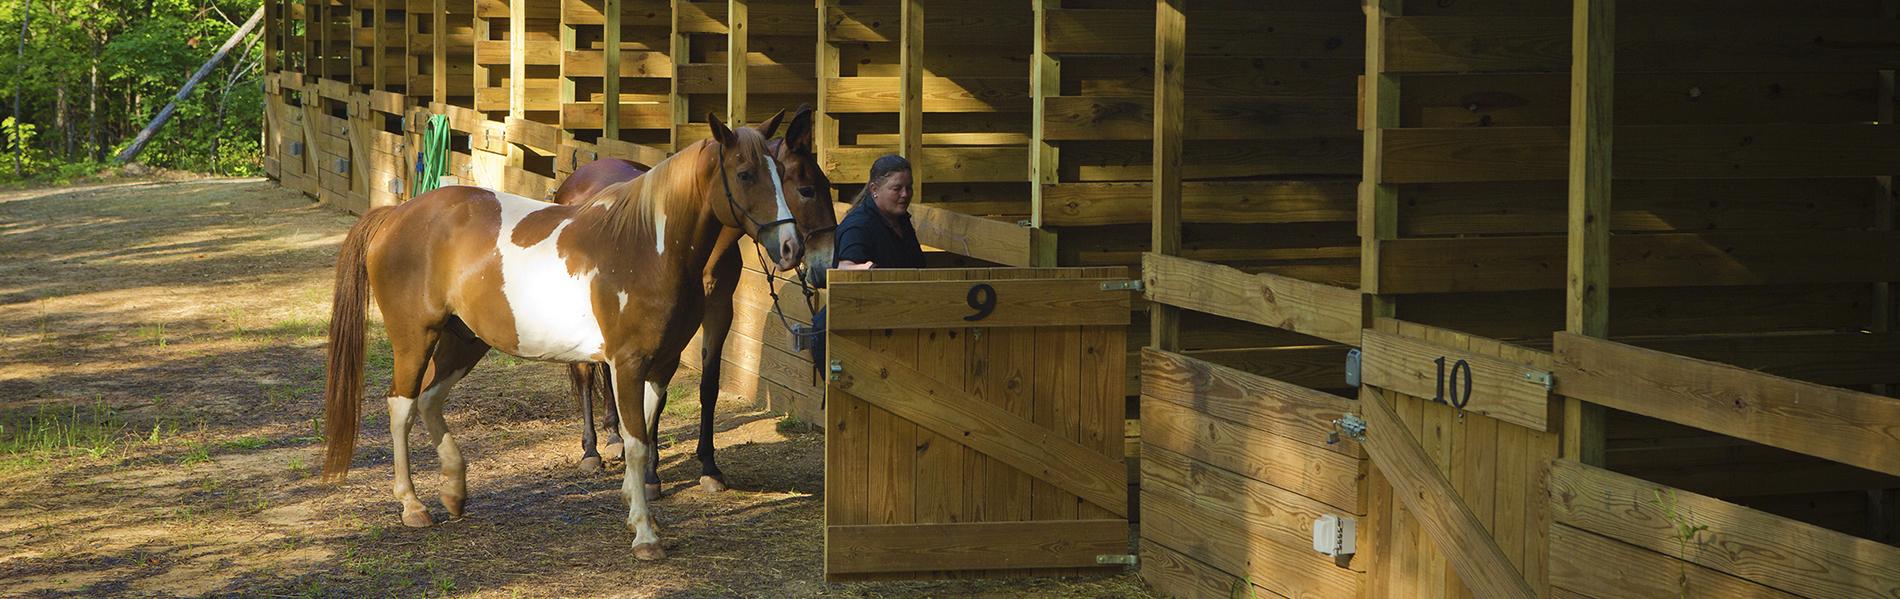 Horseback Riding at A.H. Stephens